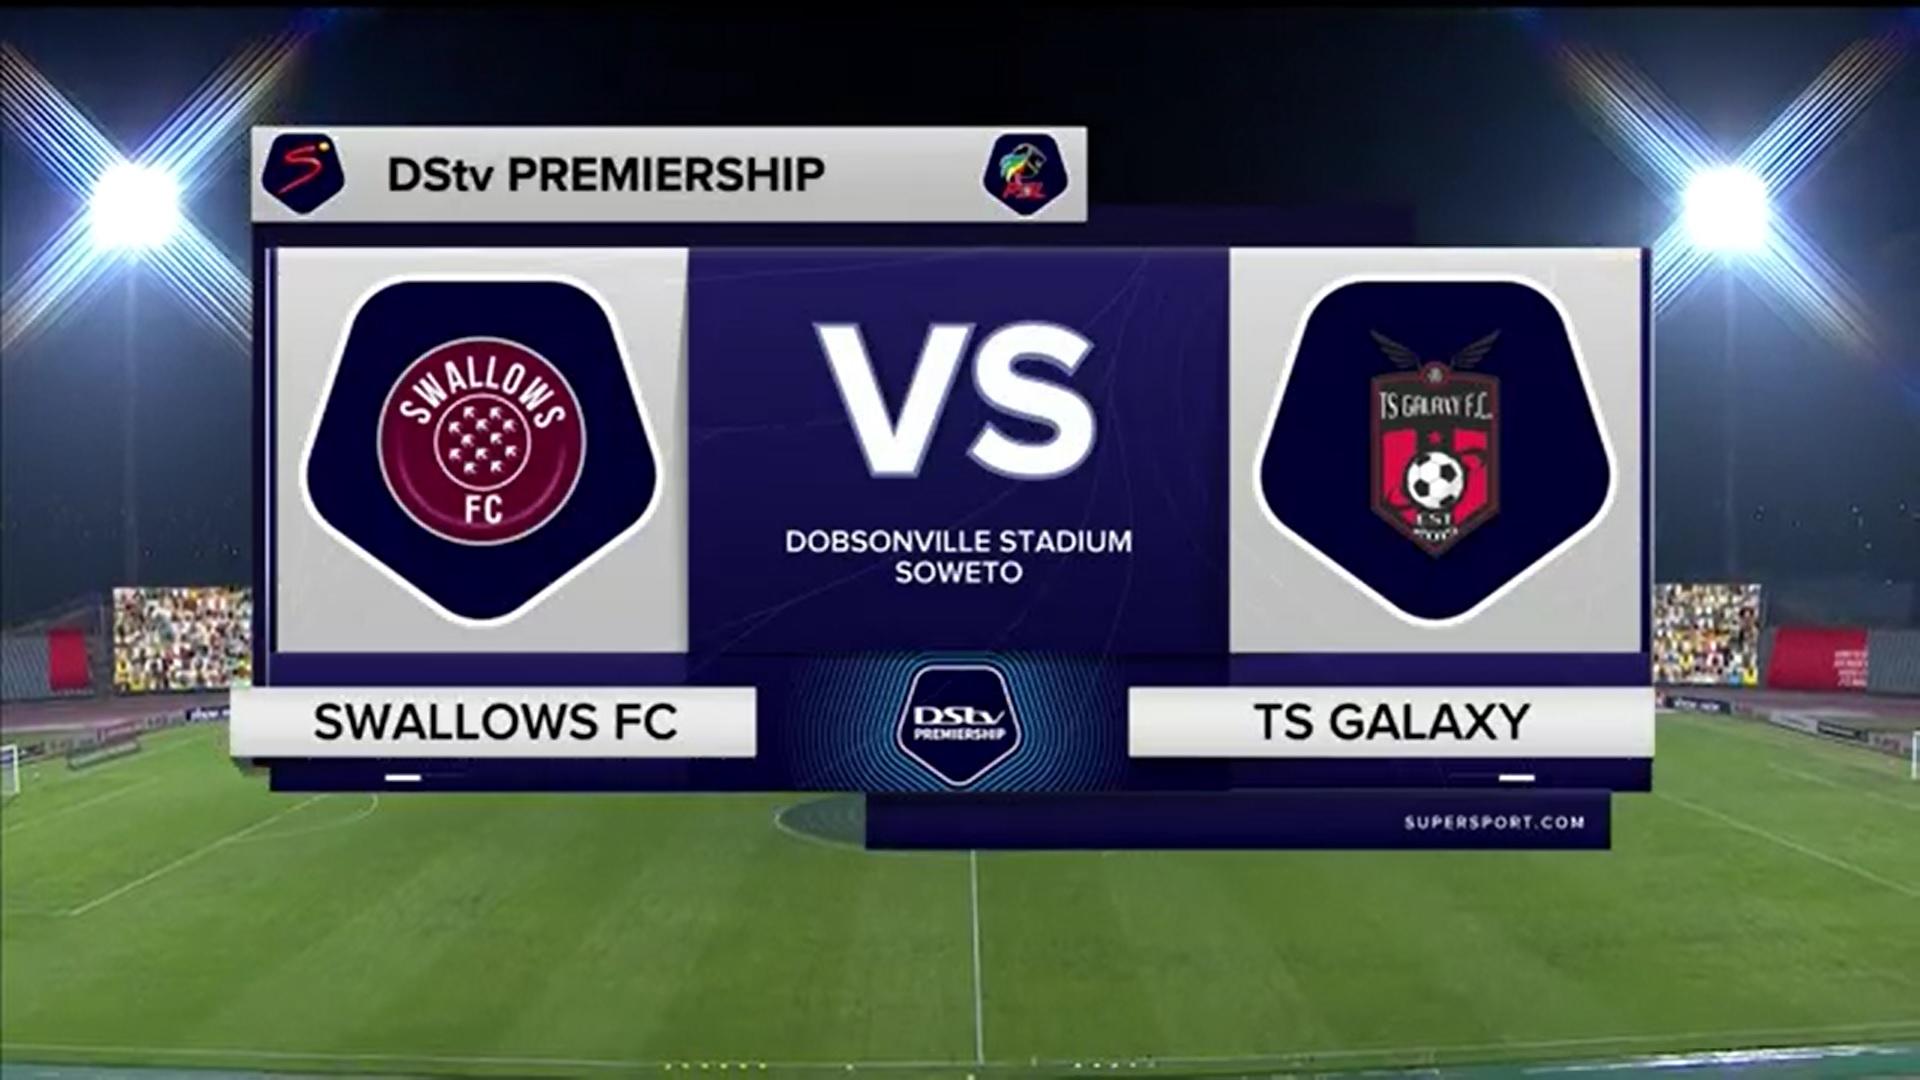 DStv Premiership | Swallows FC v TS Galaxy FC | Highlights